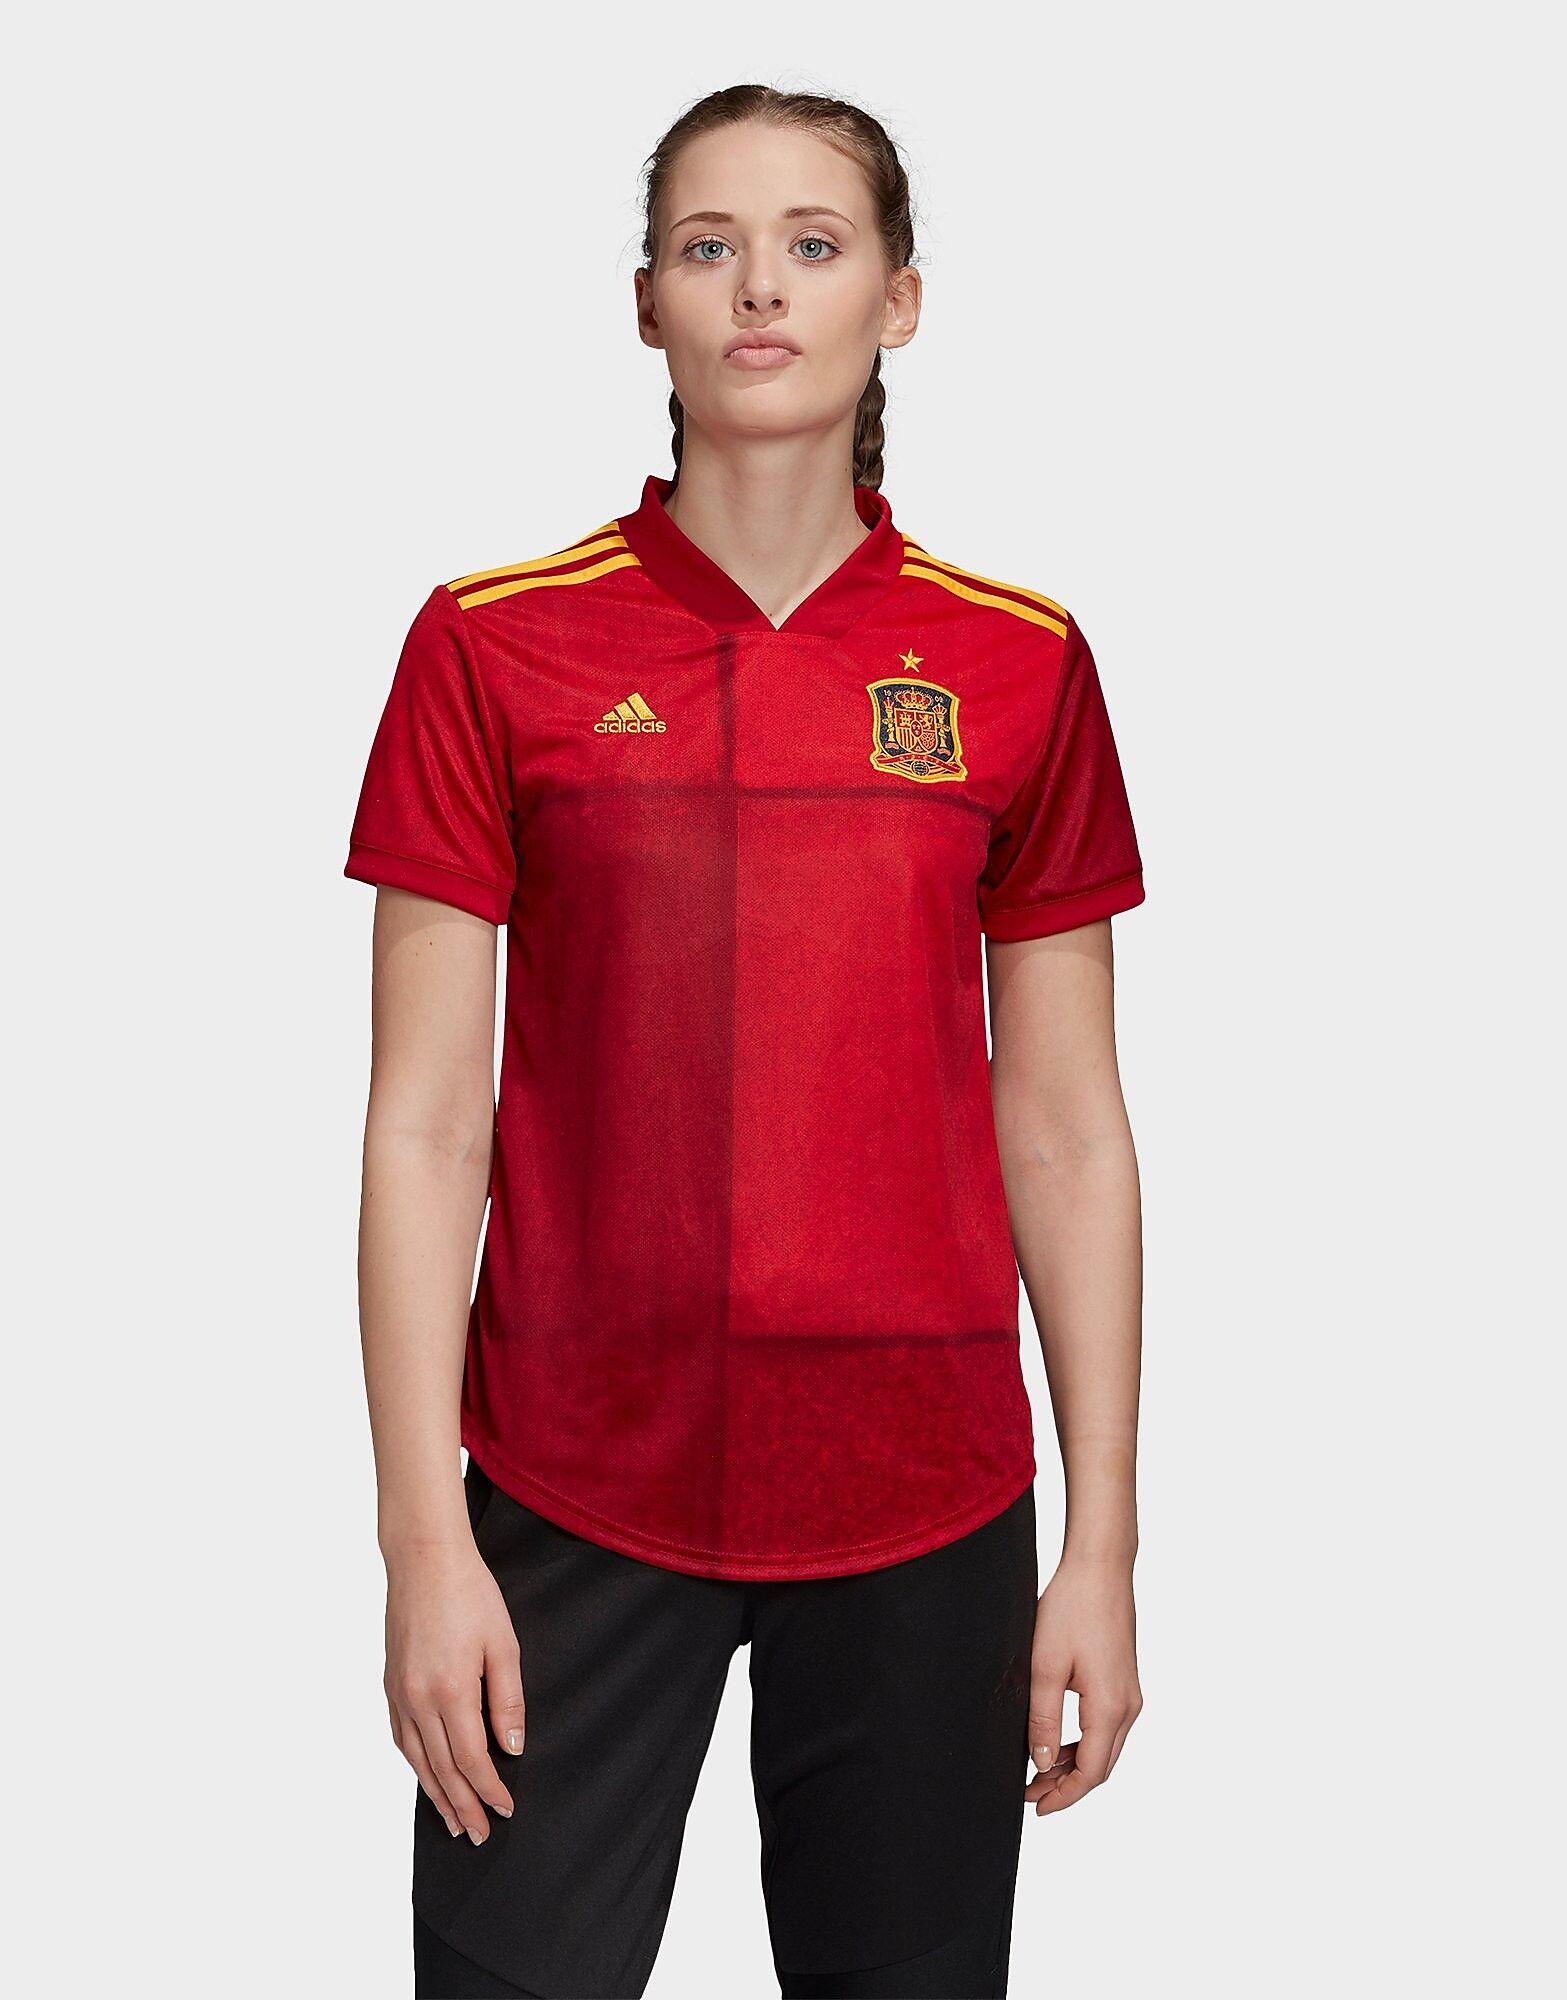 Image of Adidas Spain 2020 Kotipaita Naiset - Womens, Punainen